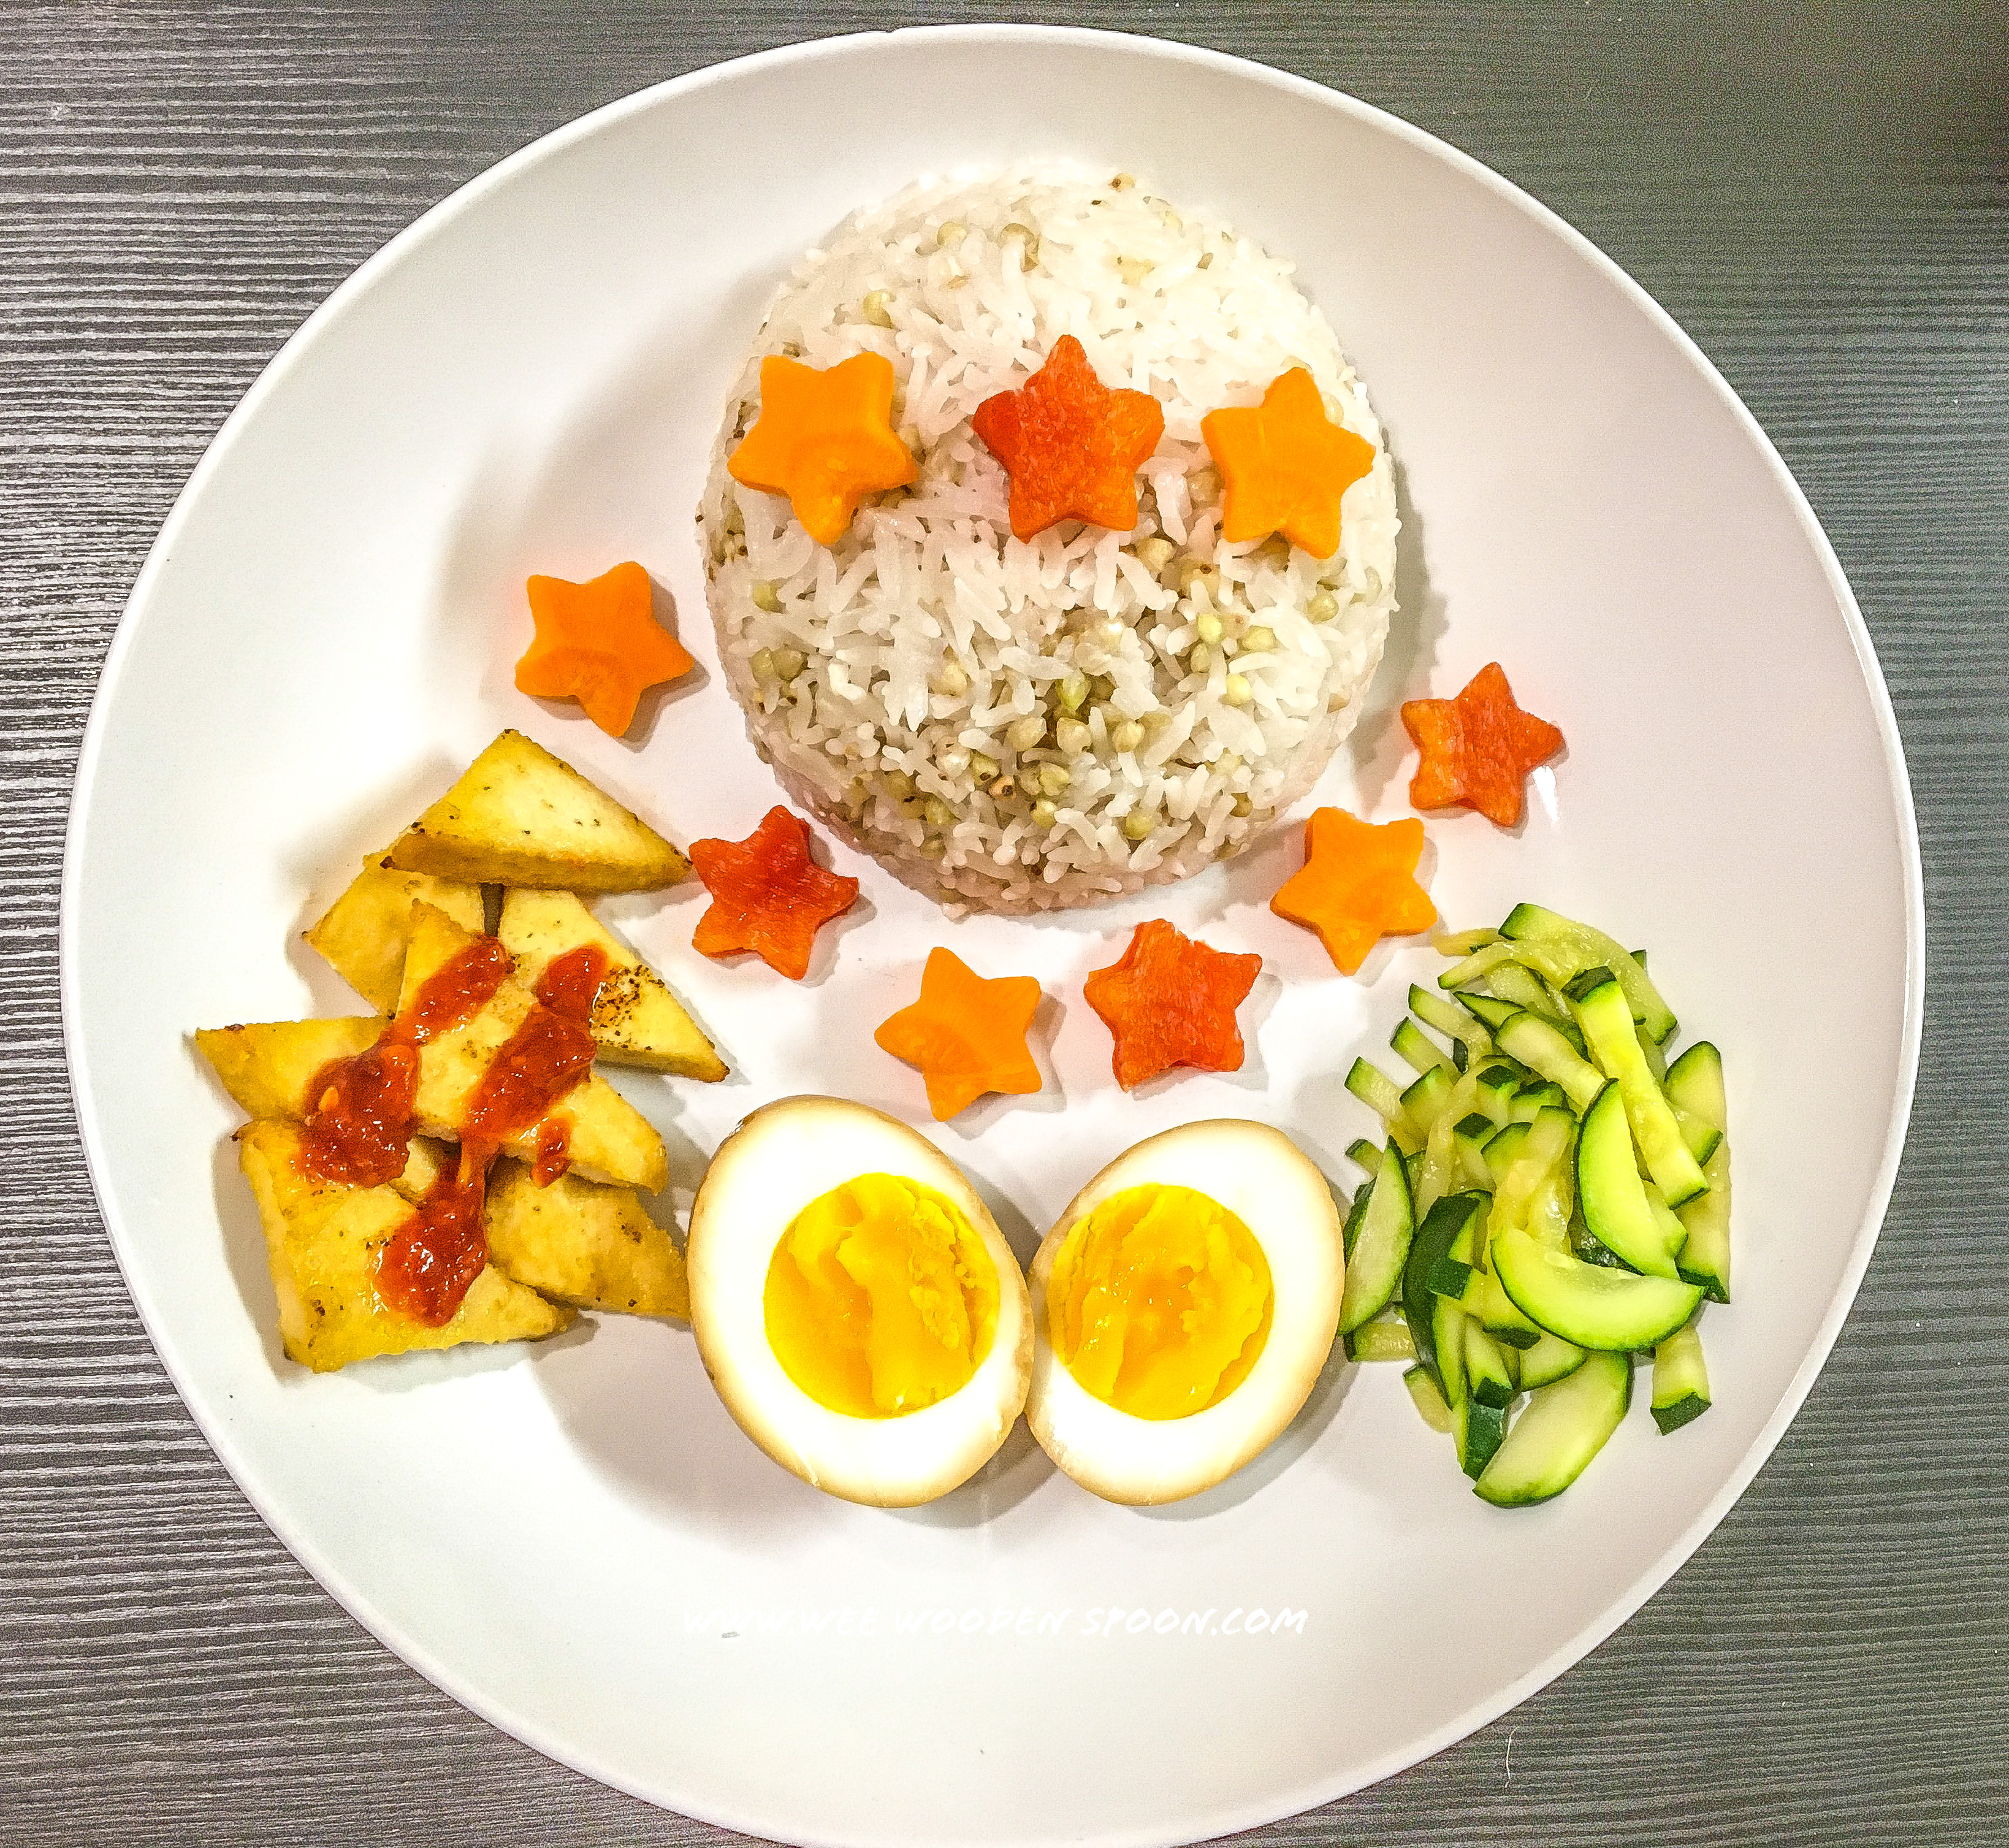 Egg, Tofu and Buckwheat Nourish Bowl